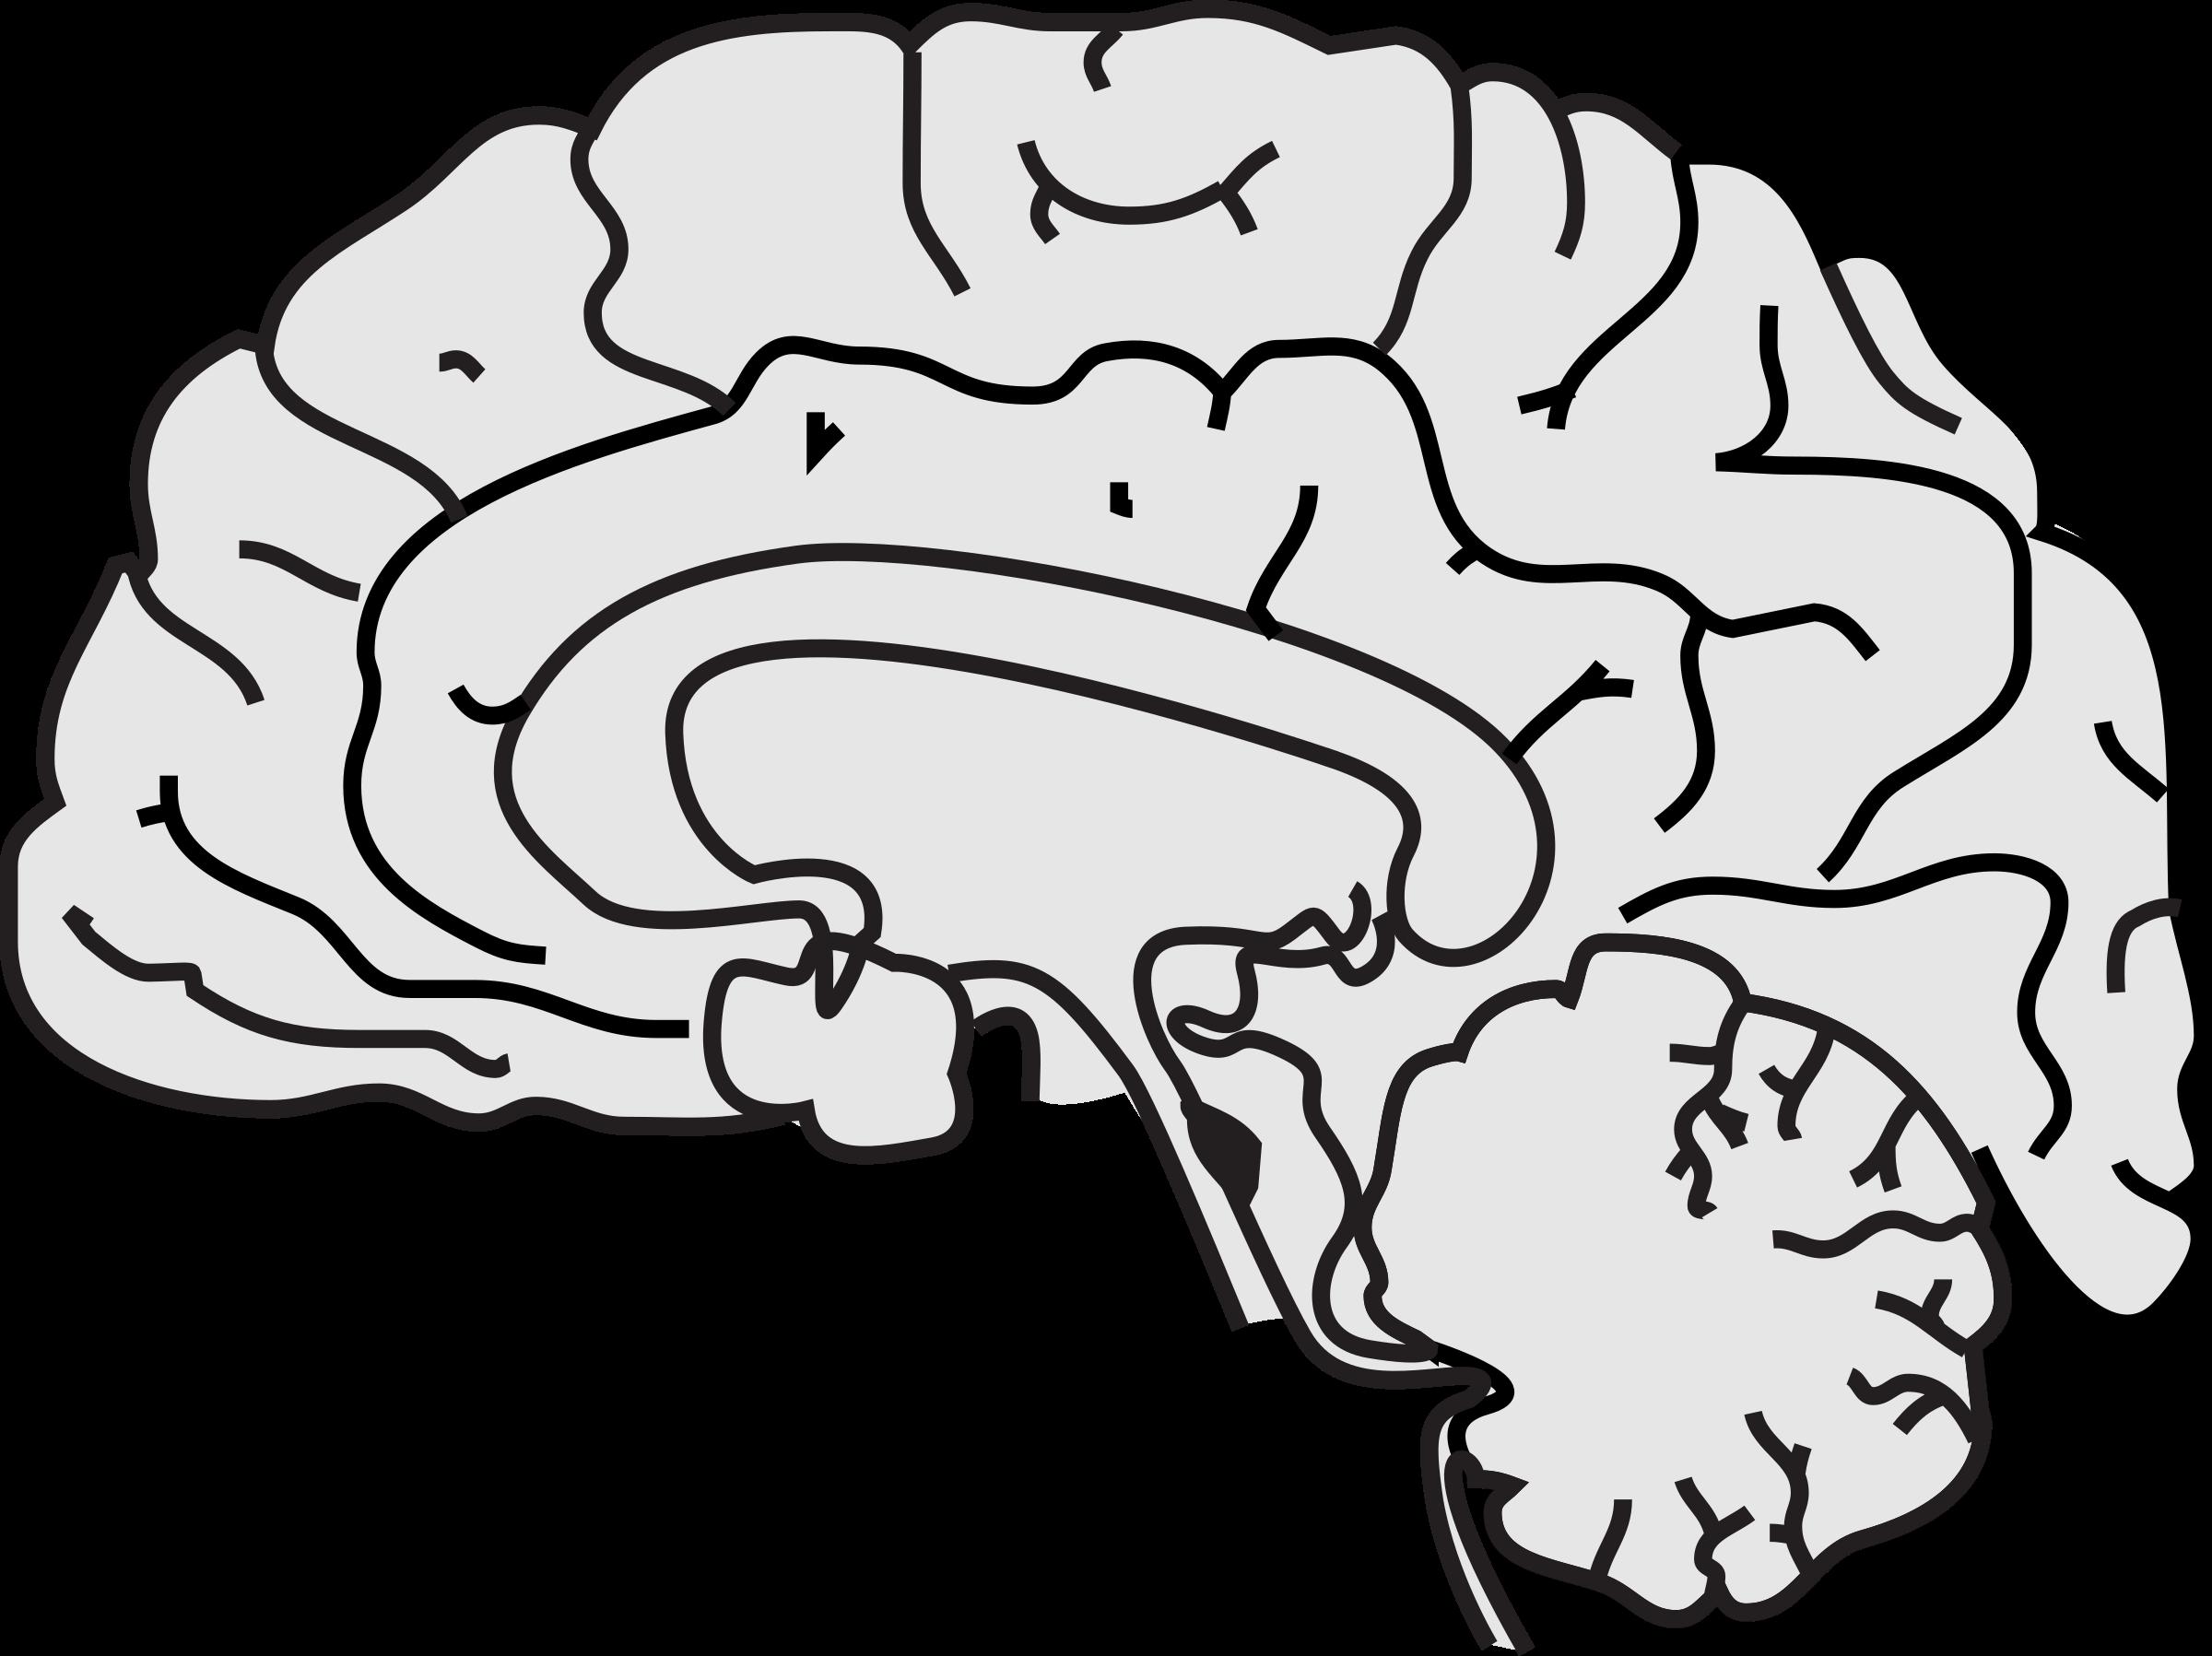 Simple big image png. Clipart brain pdf